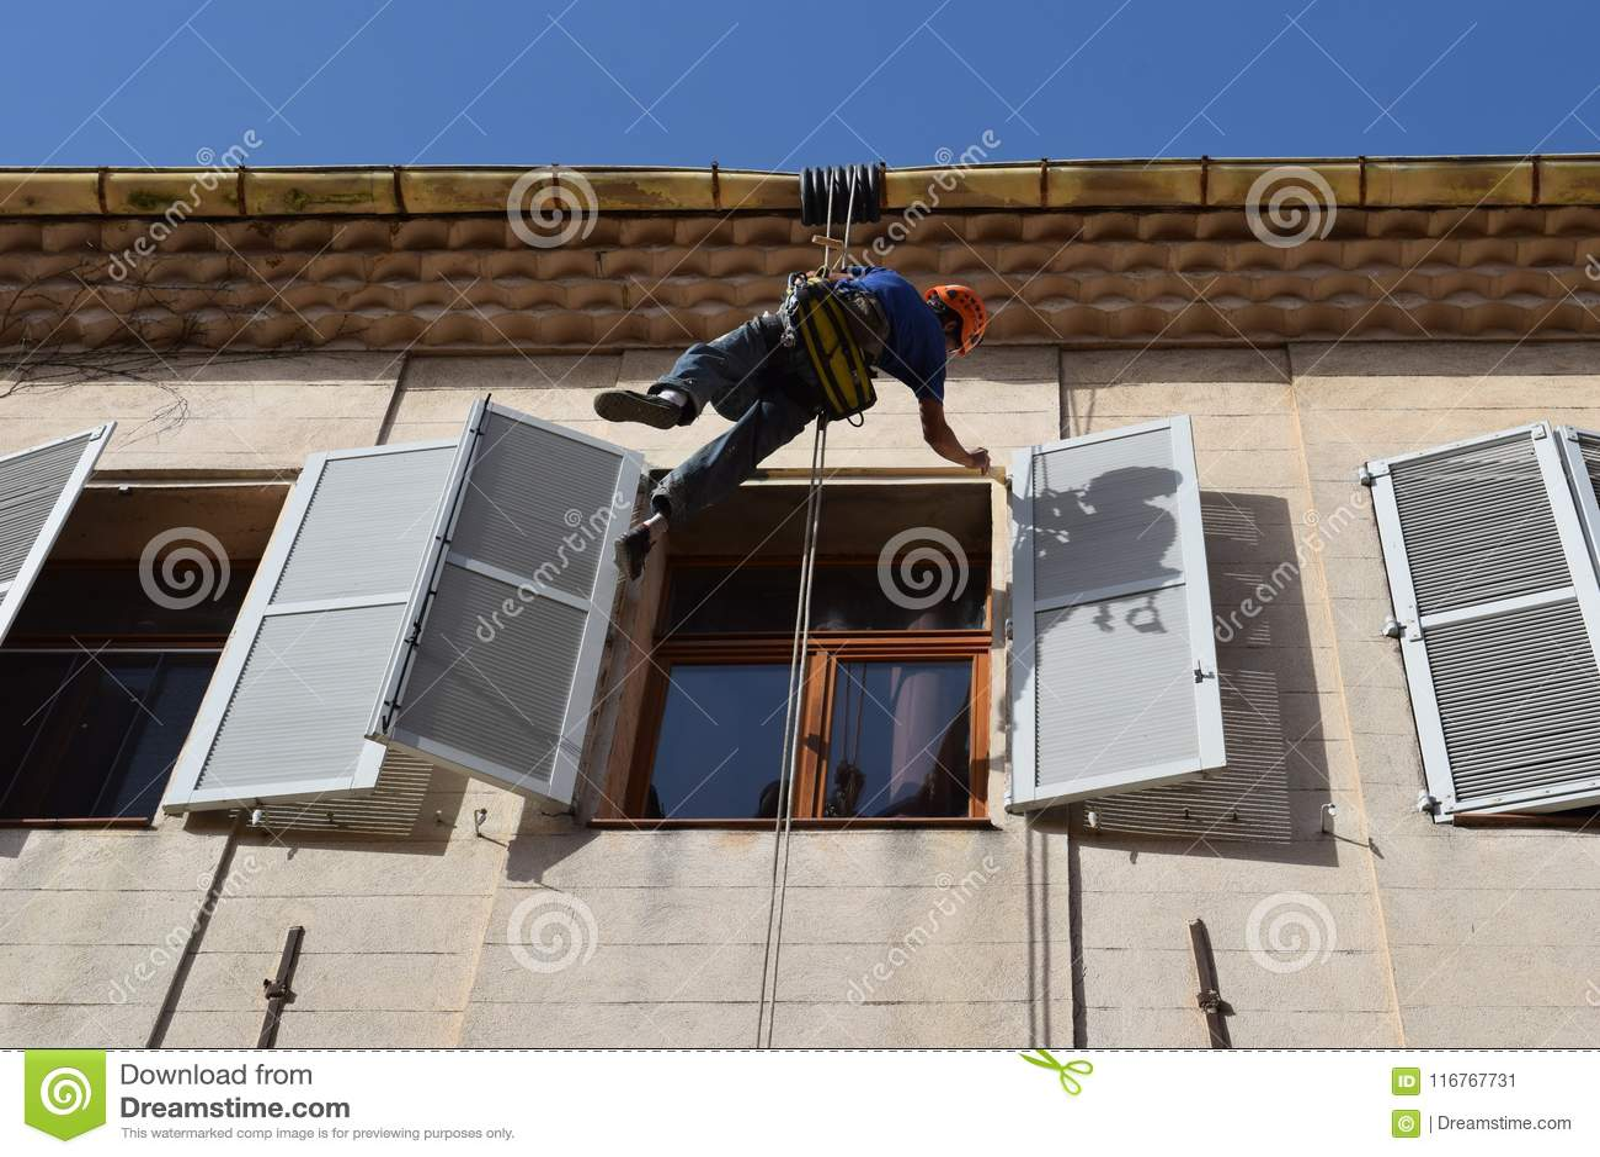 Construction Aix En Provence painter on ropes repairs shutters aix-en-provence france